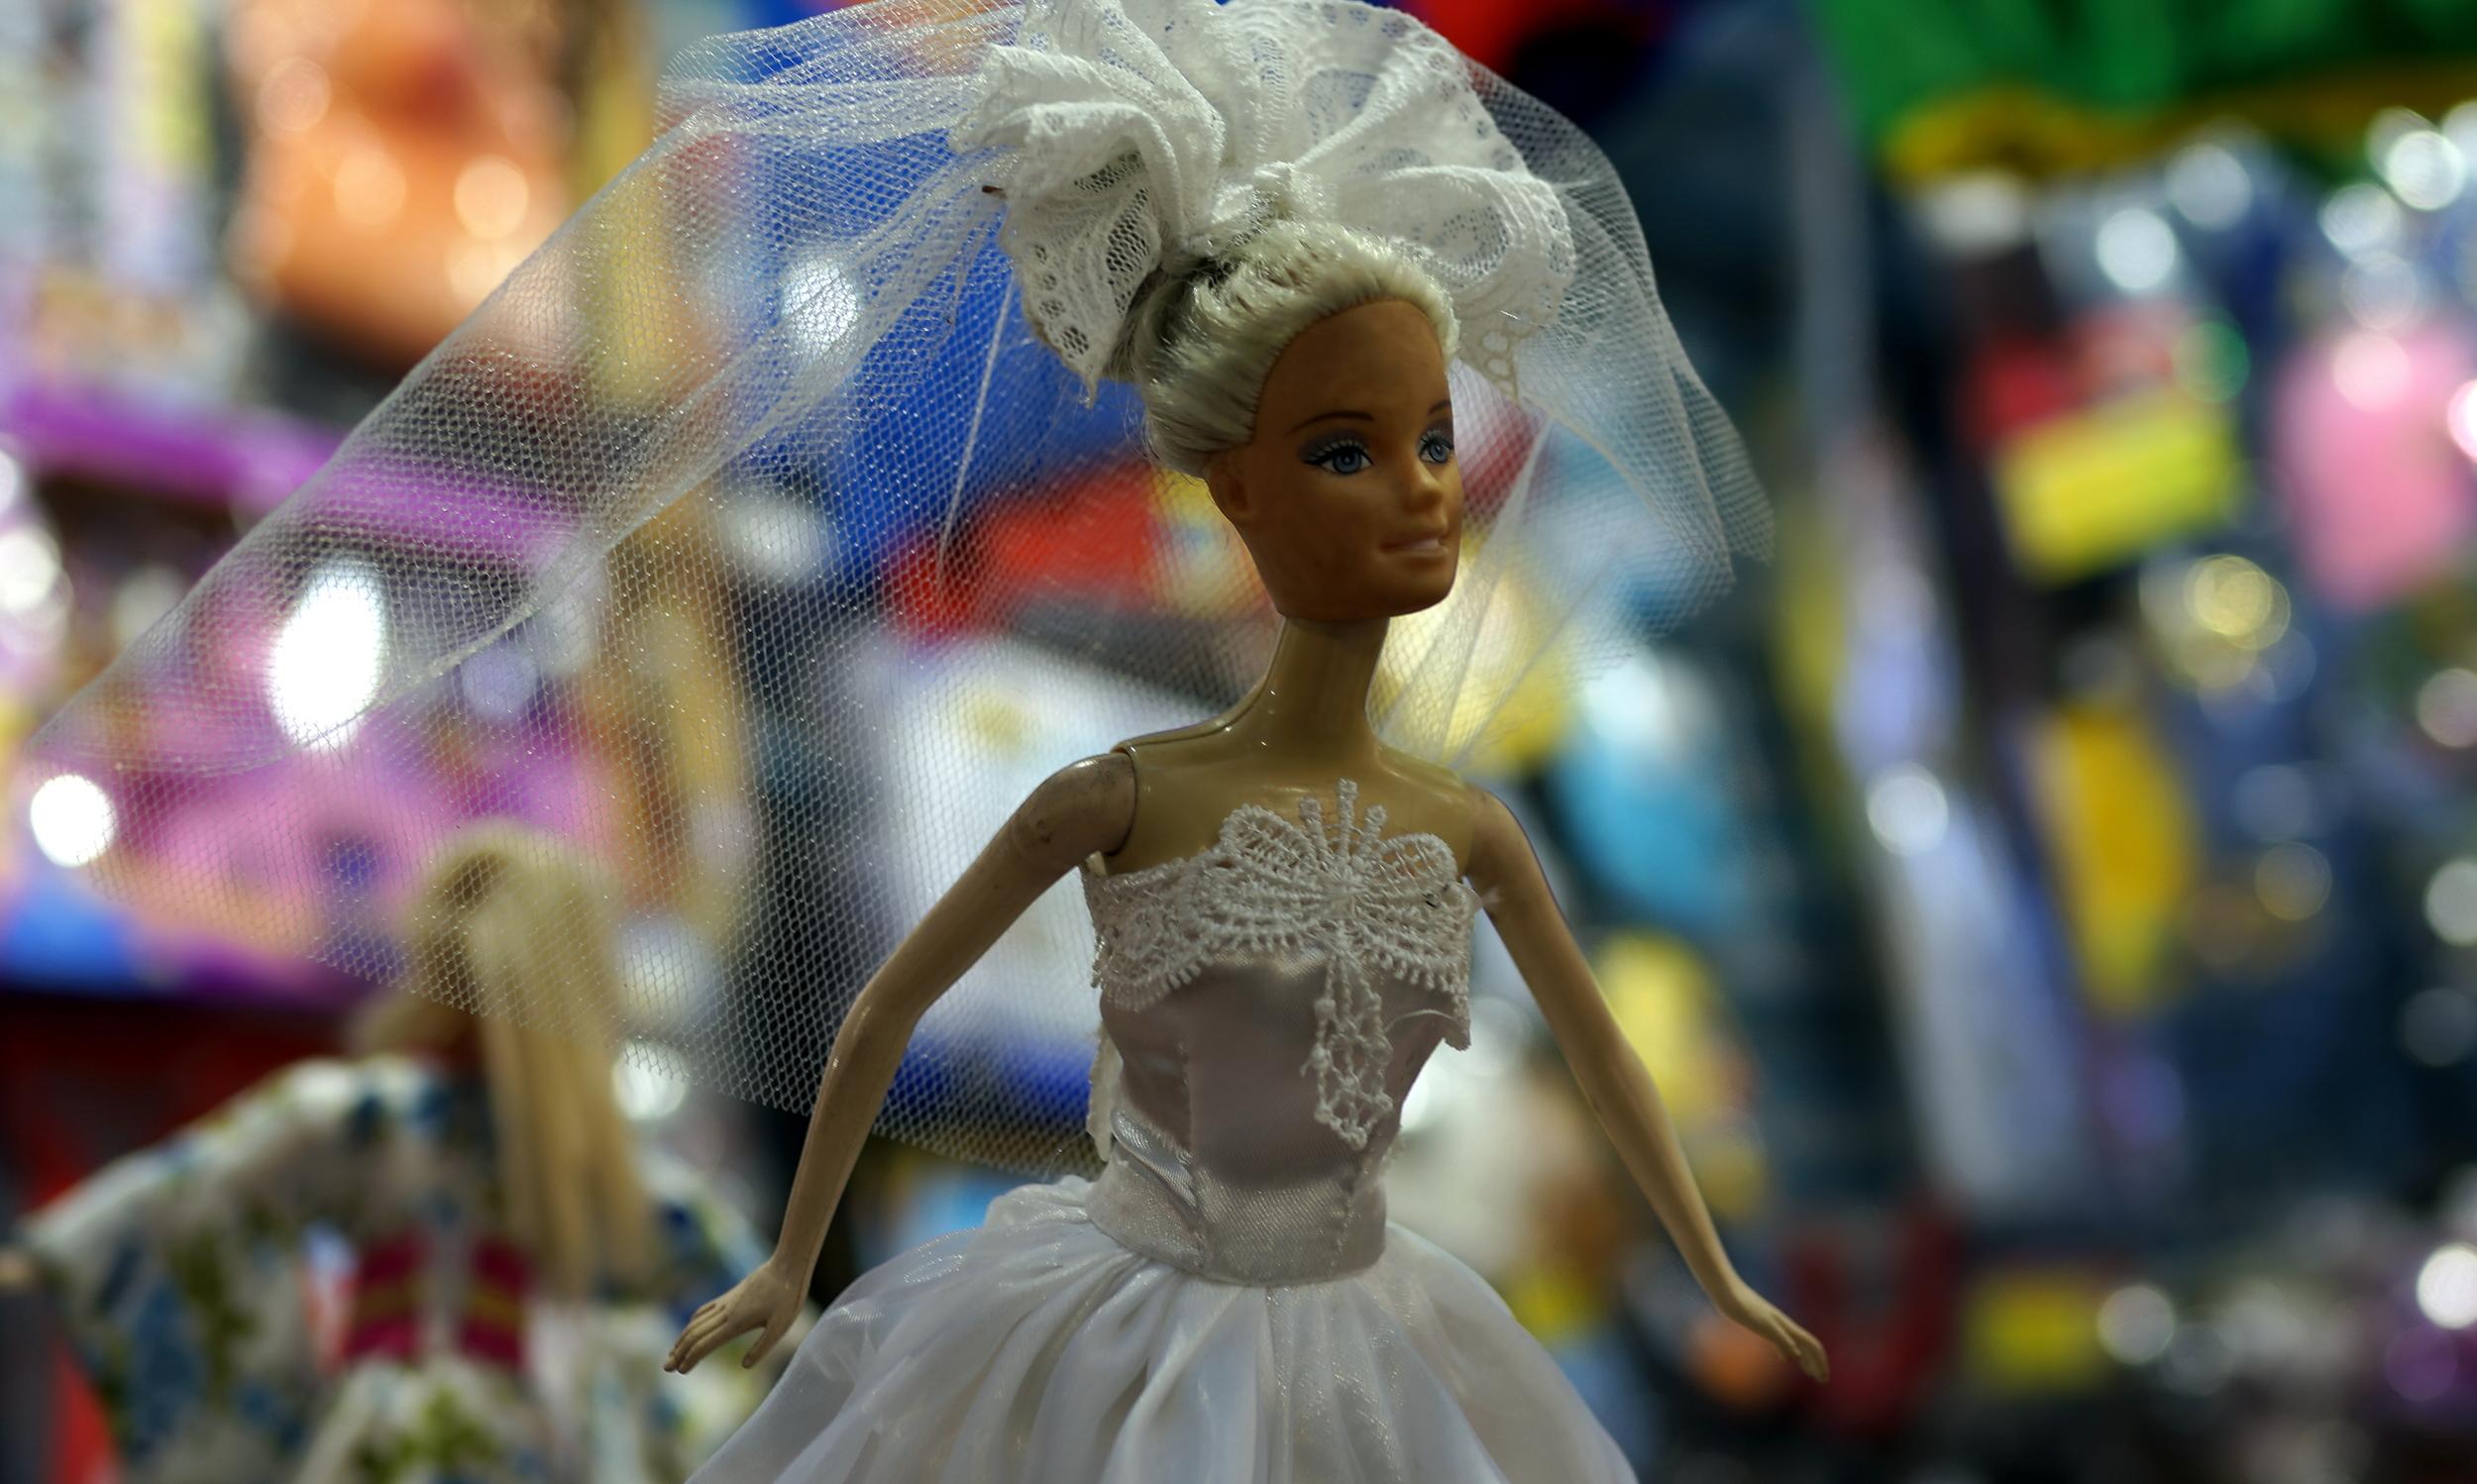 A fake Barbie at the Ladies Market in MongKok.